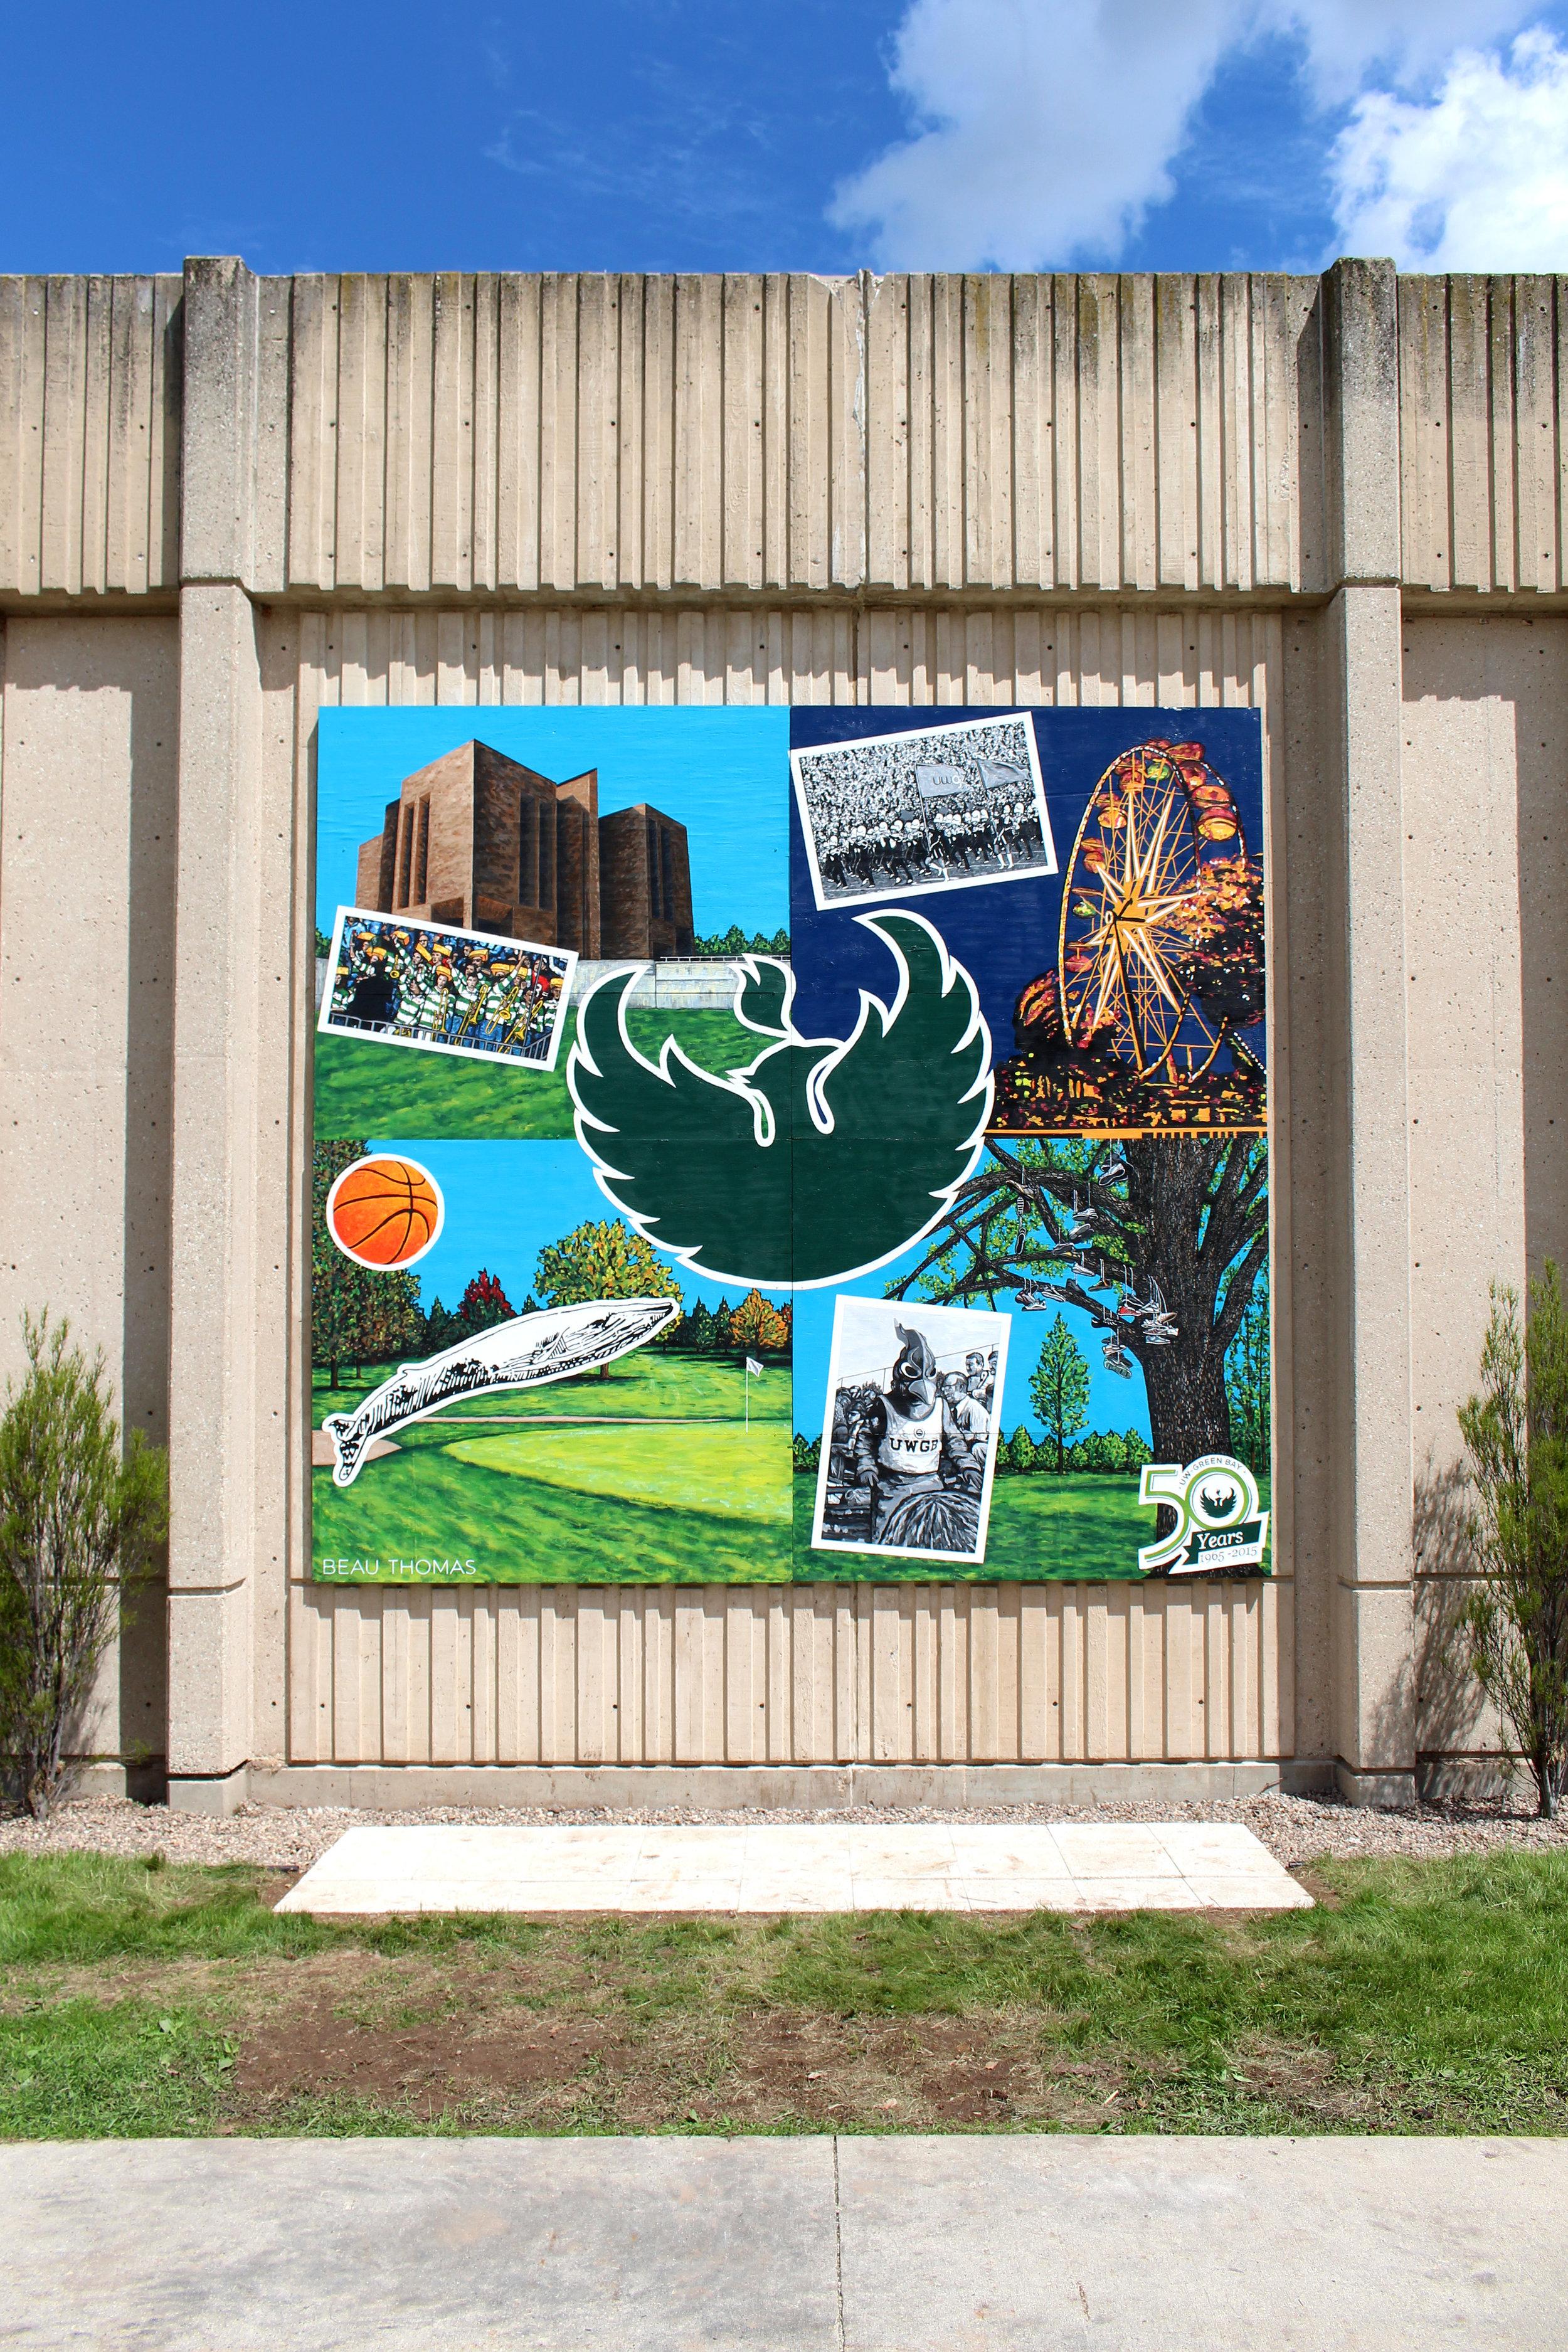 UWGB 50th Anniversary Mural